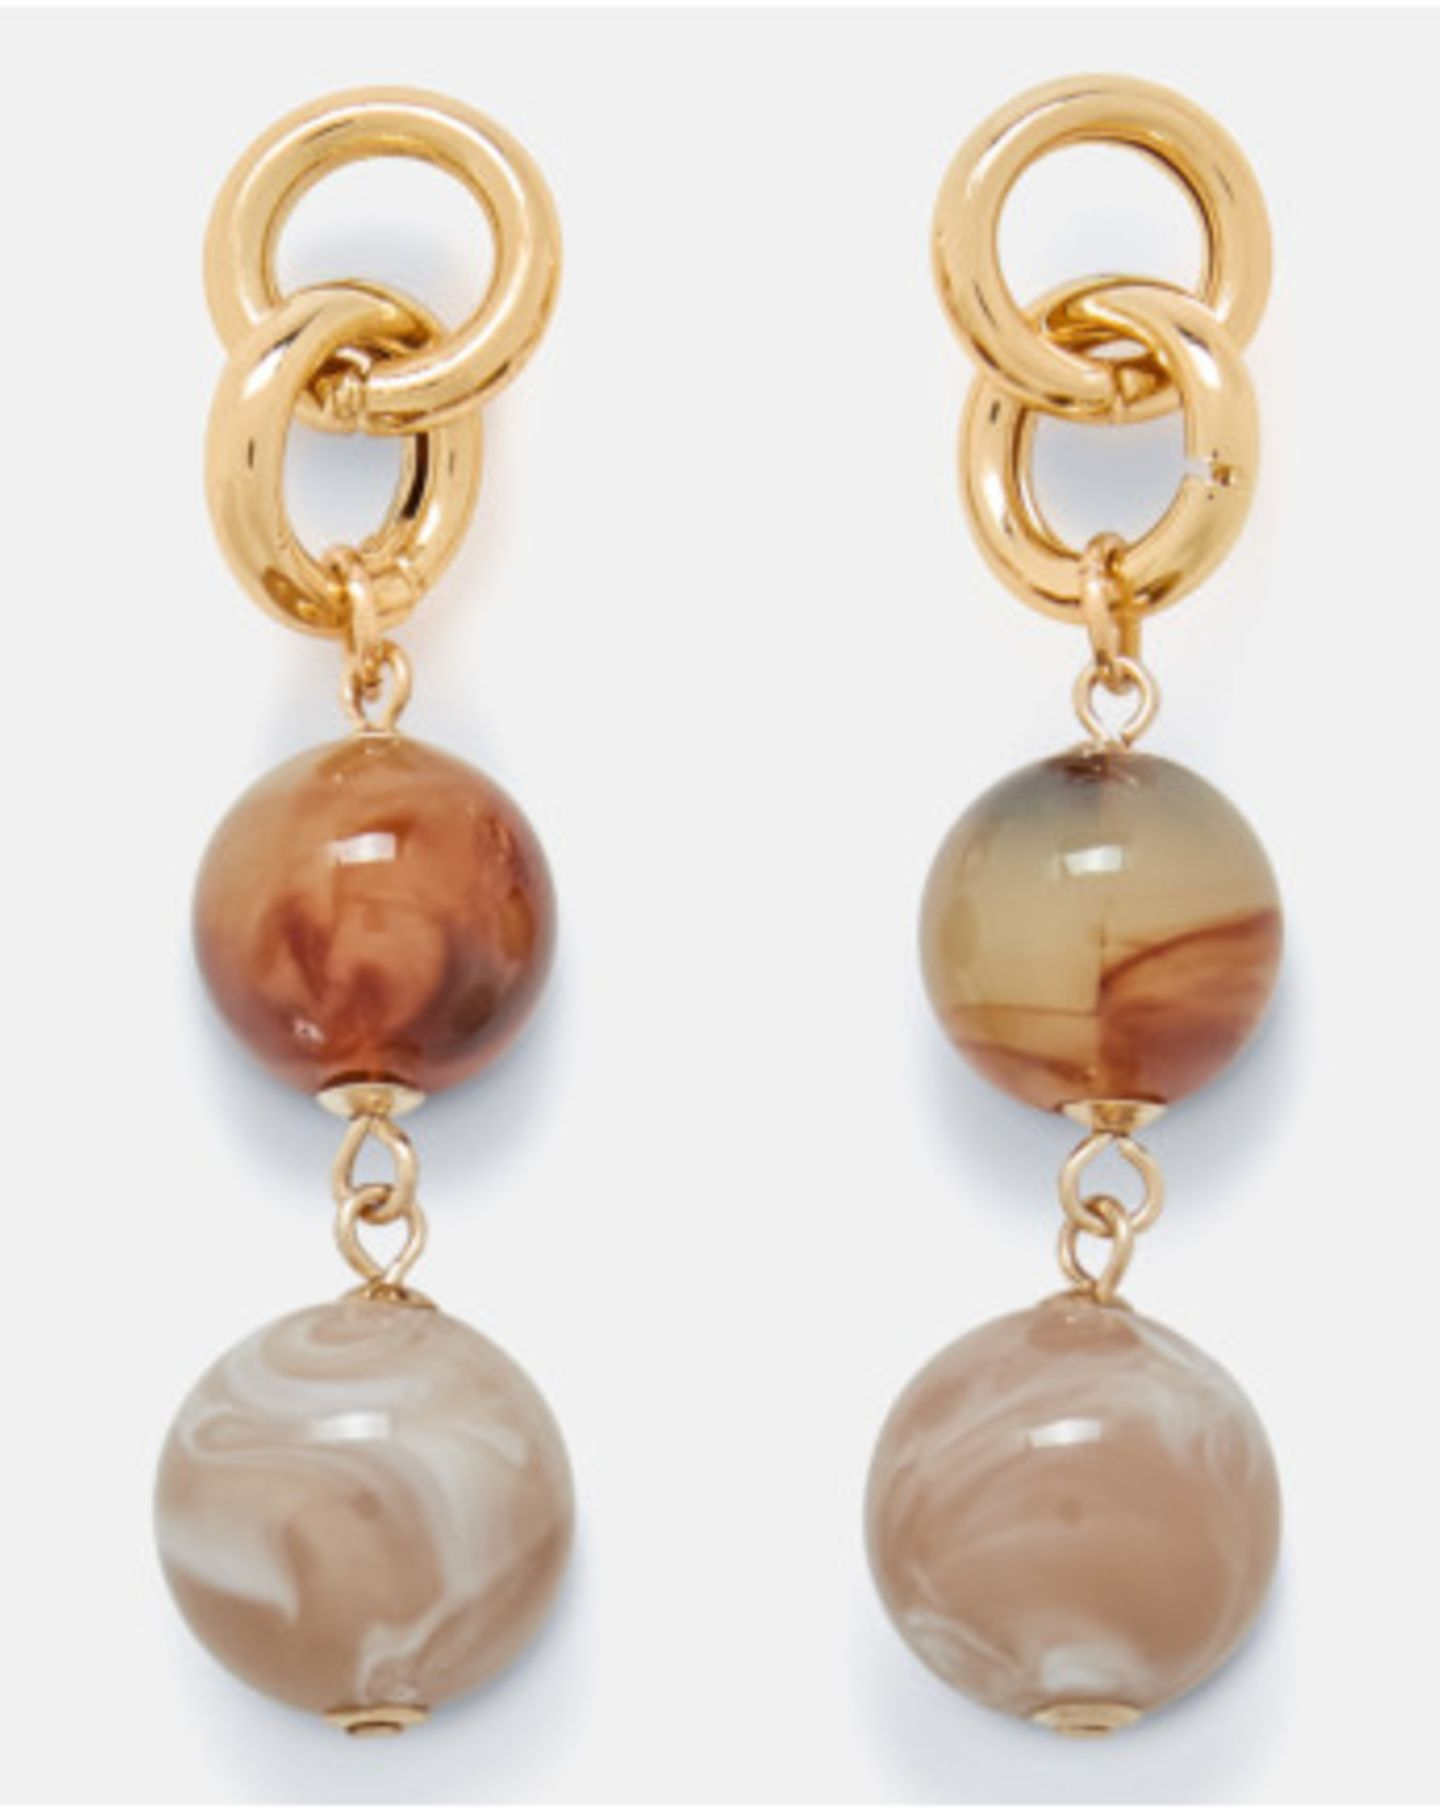 Accessoires für Curvys: Ohrringe